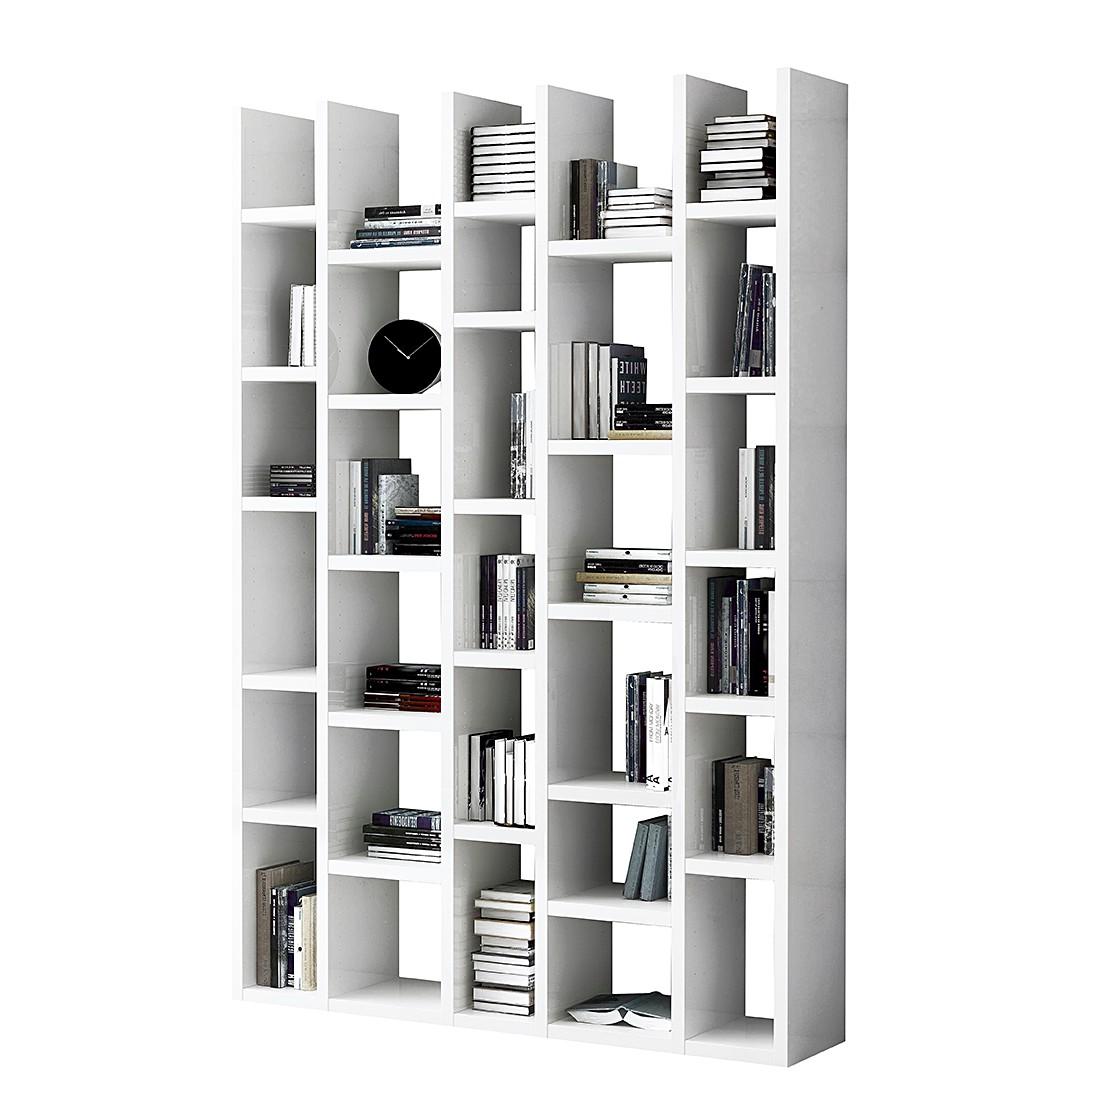 b cherregal emporior i matt wei loftscape g nstig. Black Bedroom Furniture Sets. Home Design Ideas